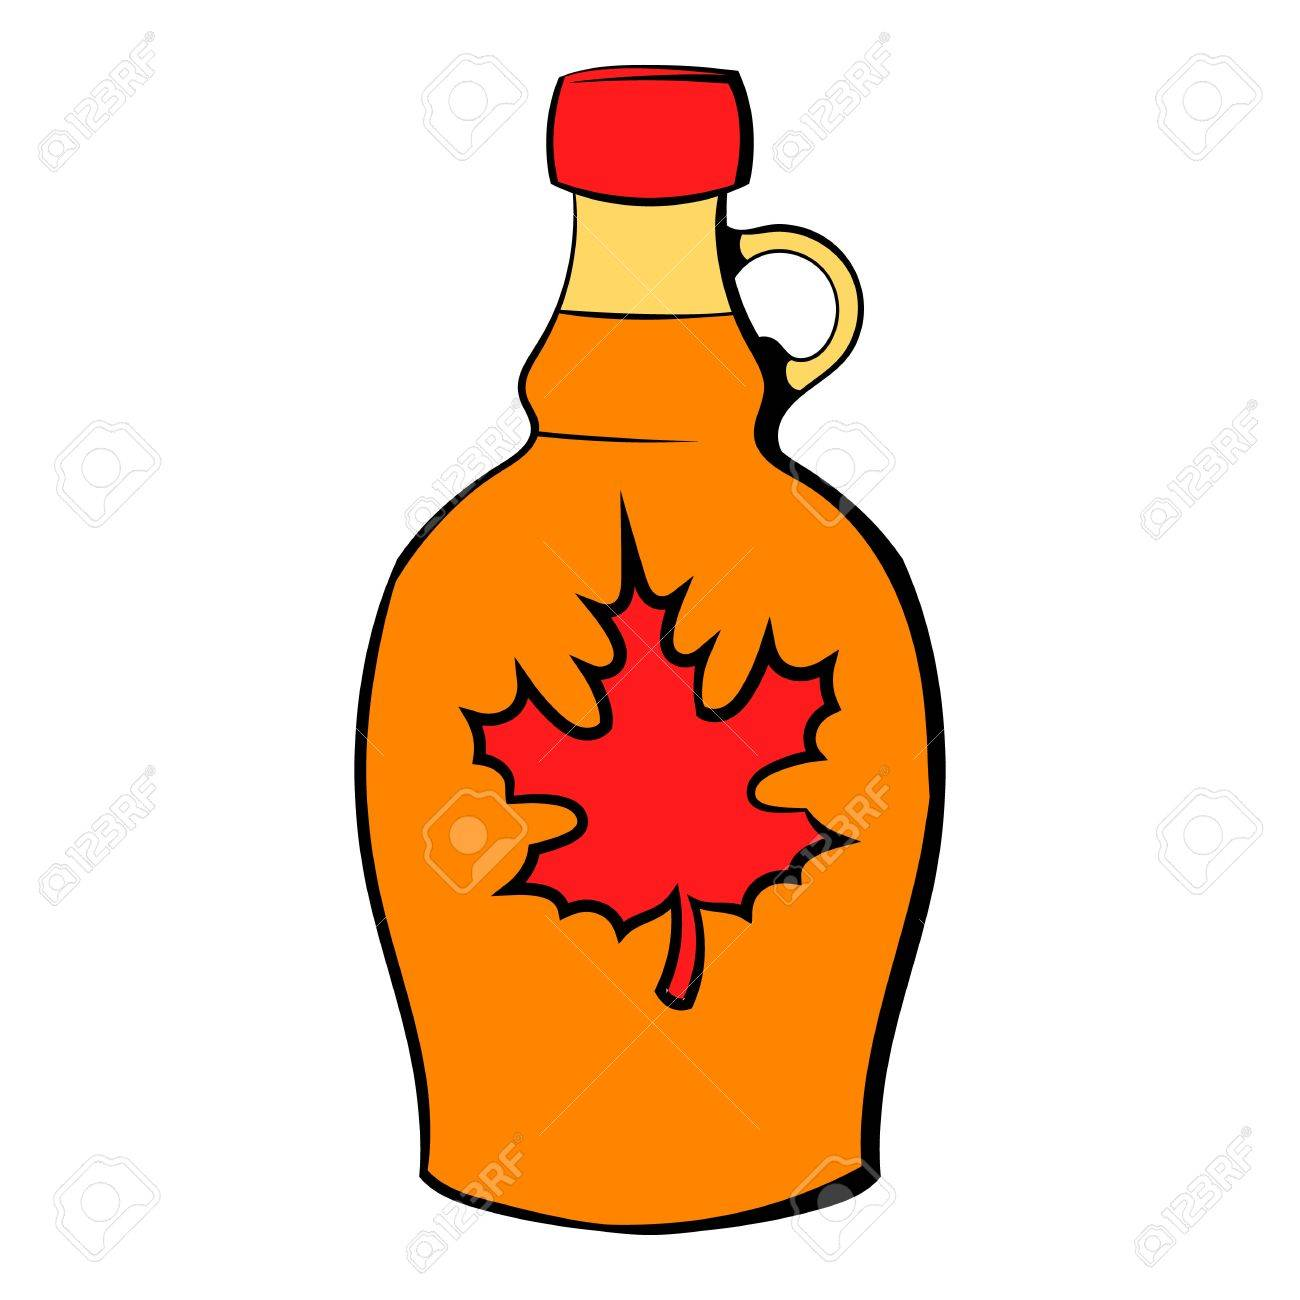 Bottle of maple syrup icon cartoon.